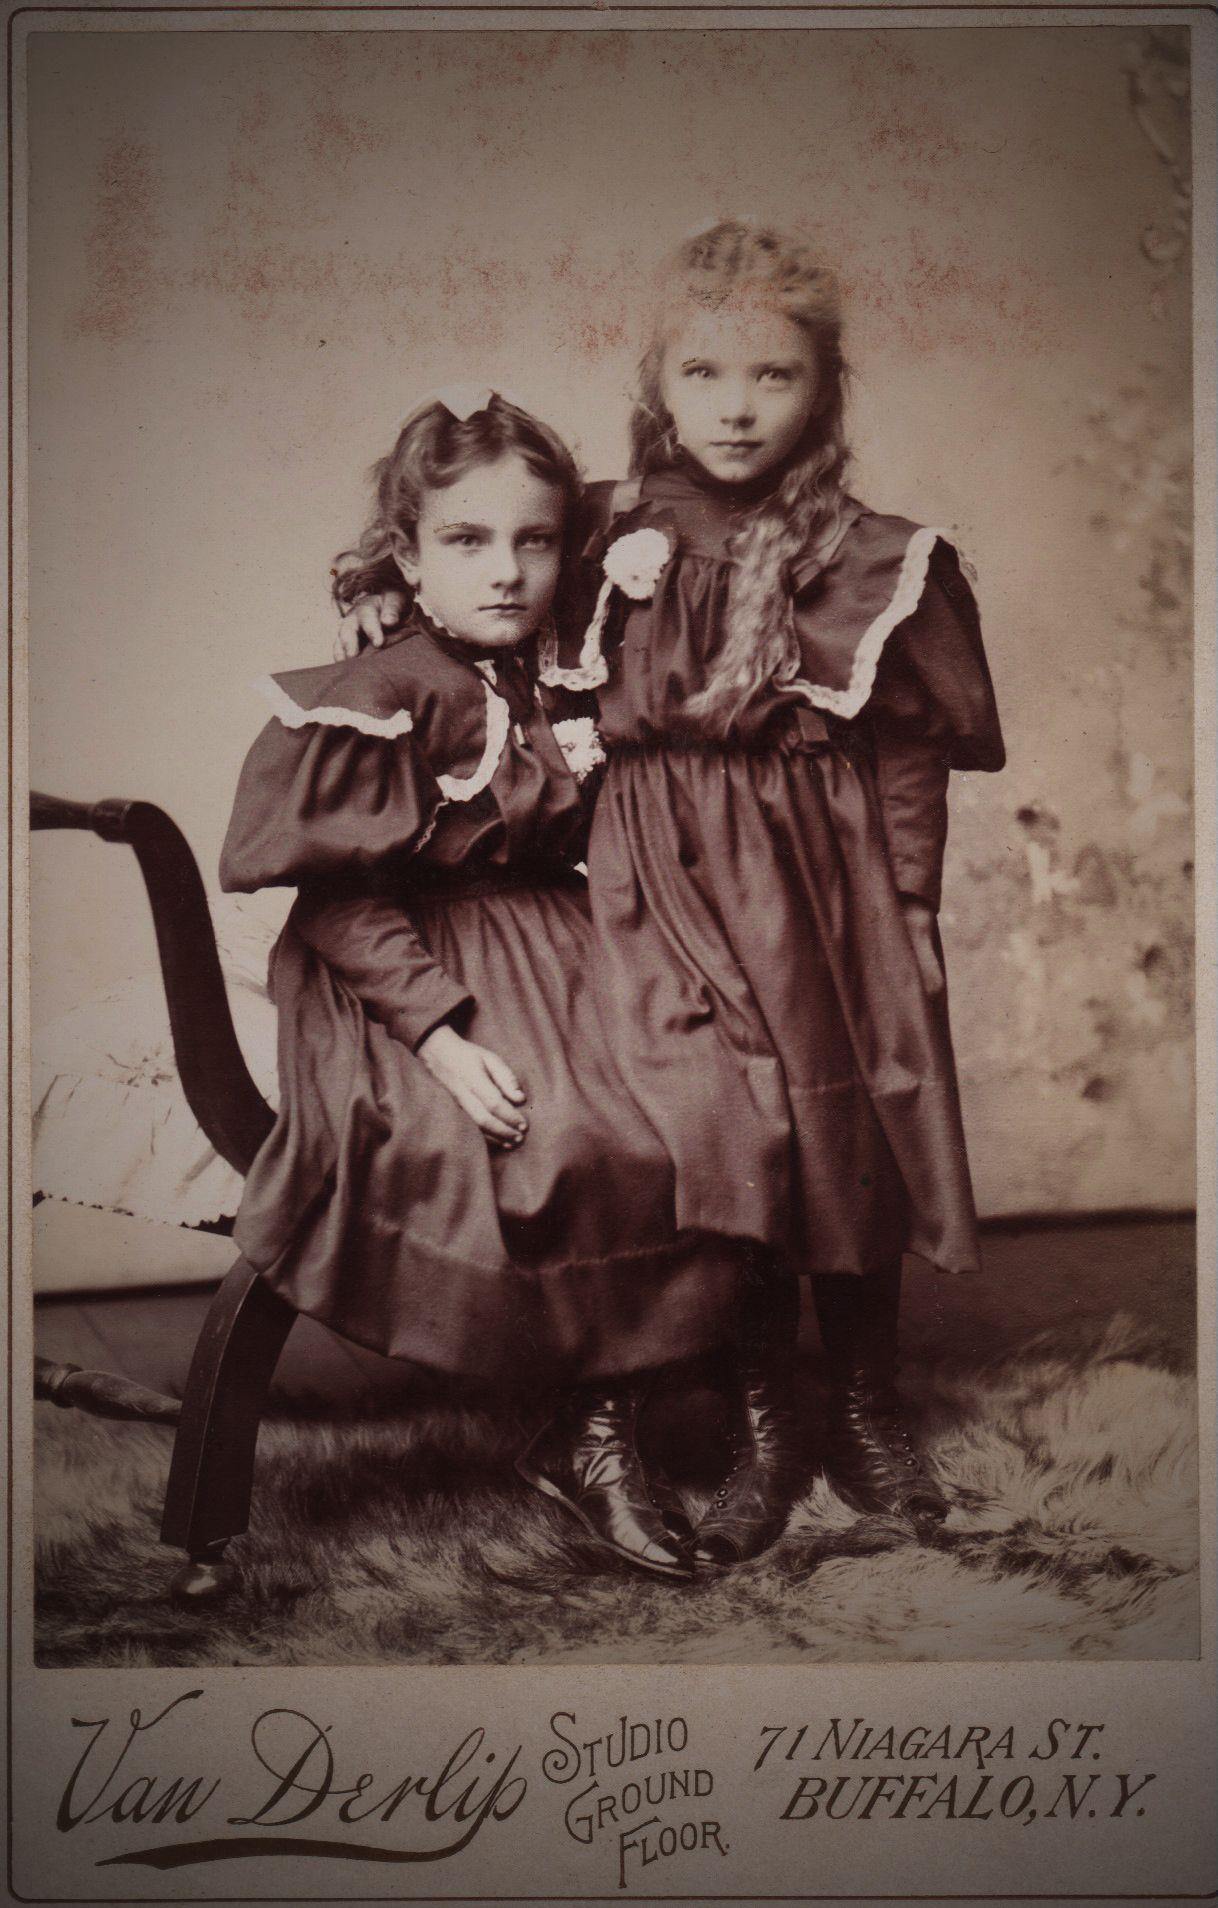 A Slightly Creepy Family Photo Of Sisters Creepy Vintage Victorian Portraits Victorian Photos